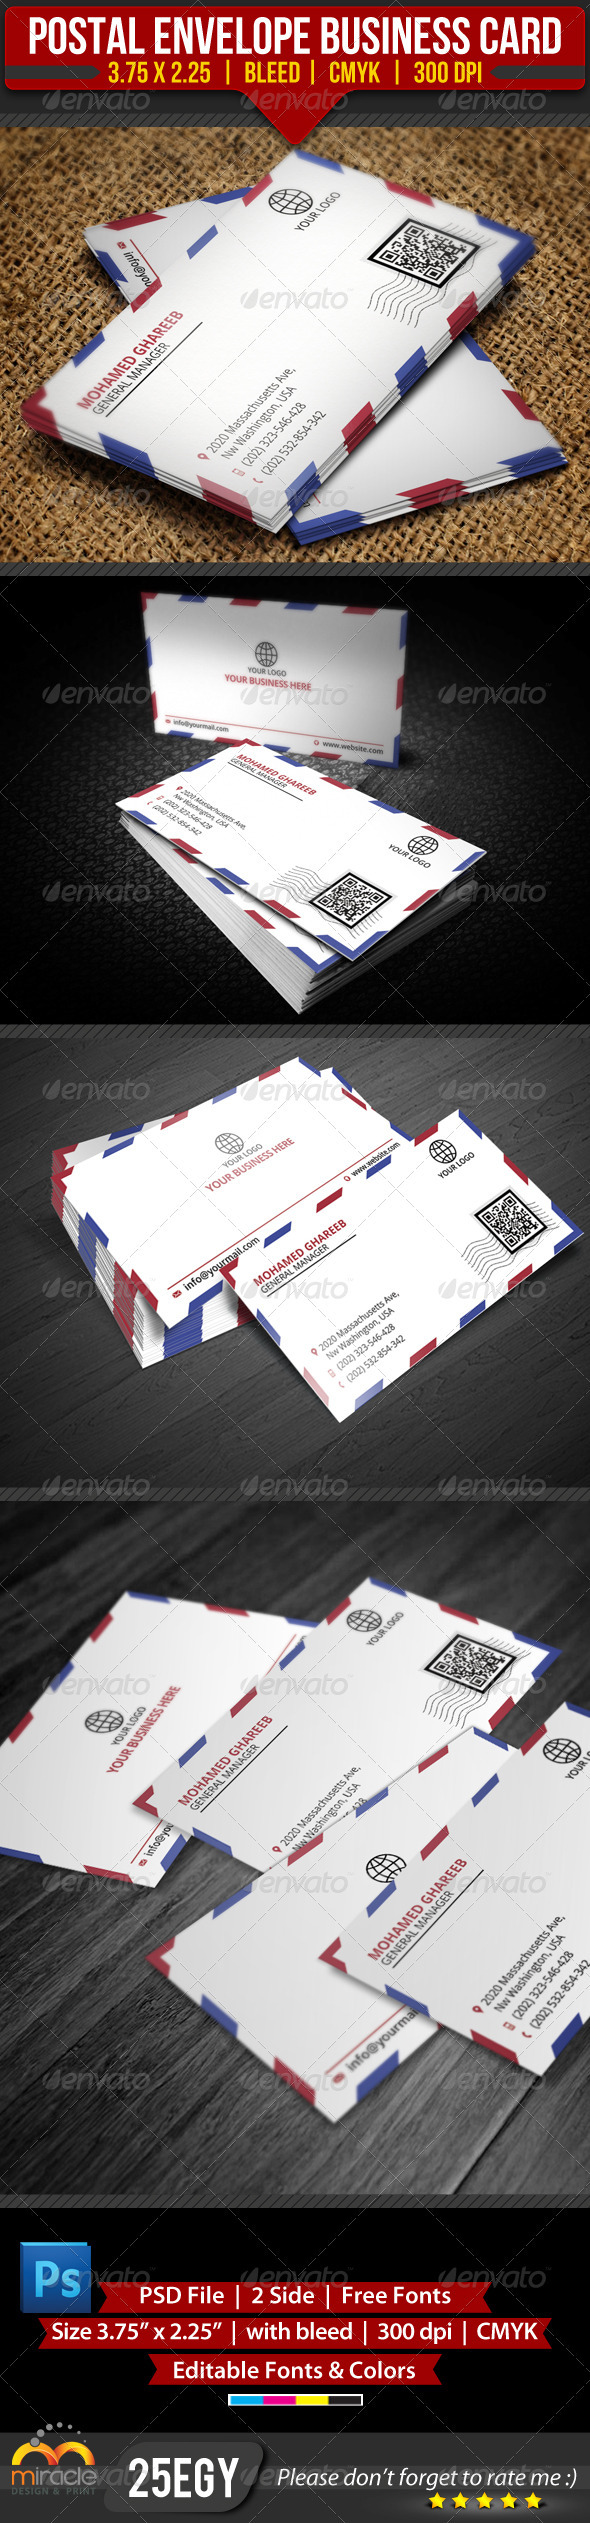 GraphicRiver Postal Envelope Business Card 3418368